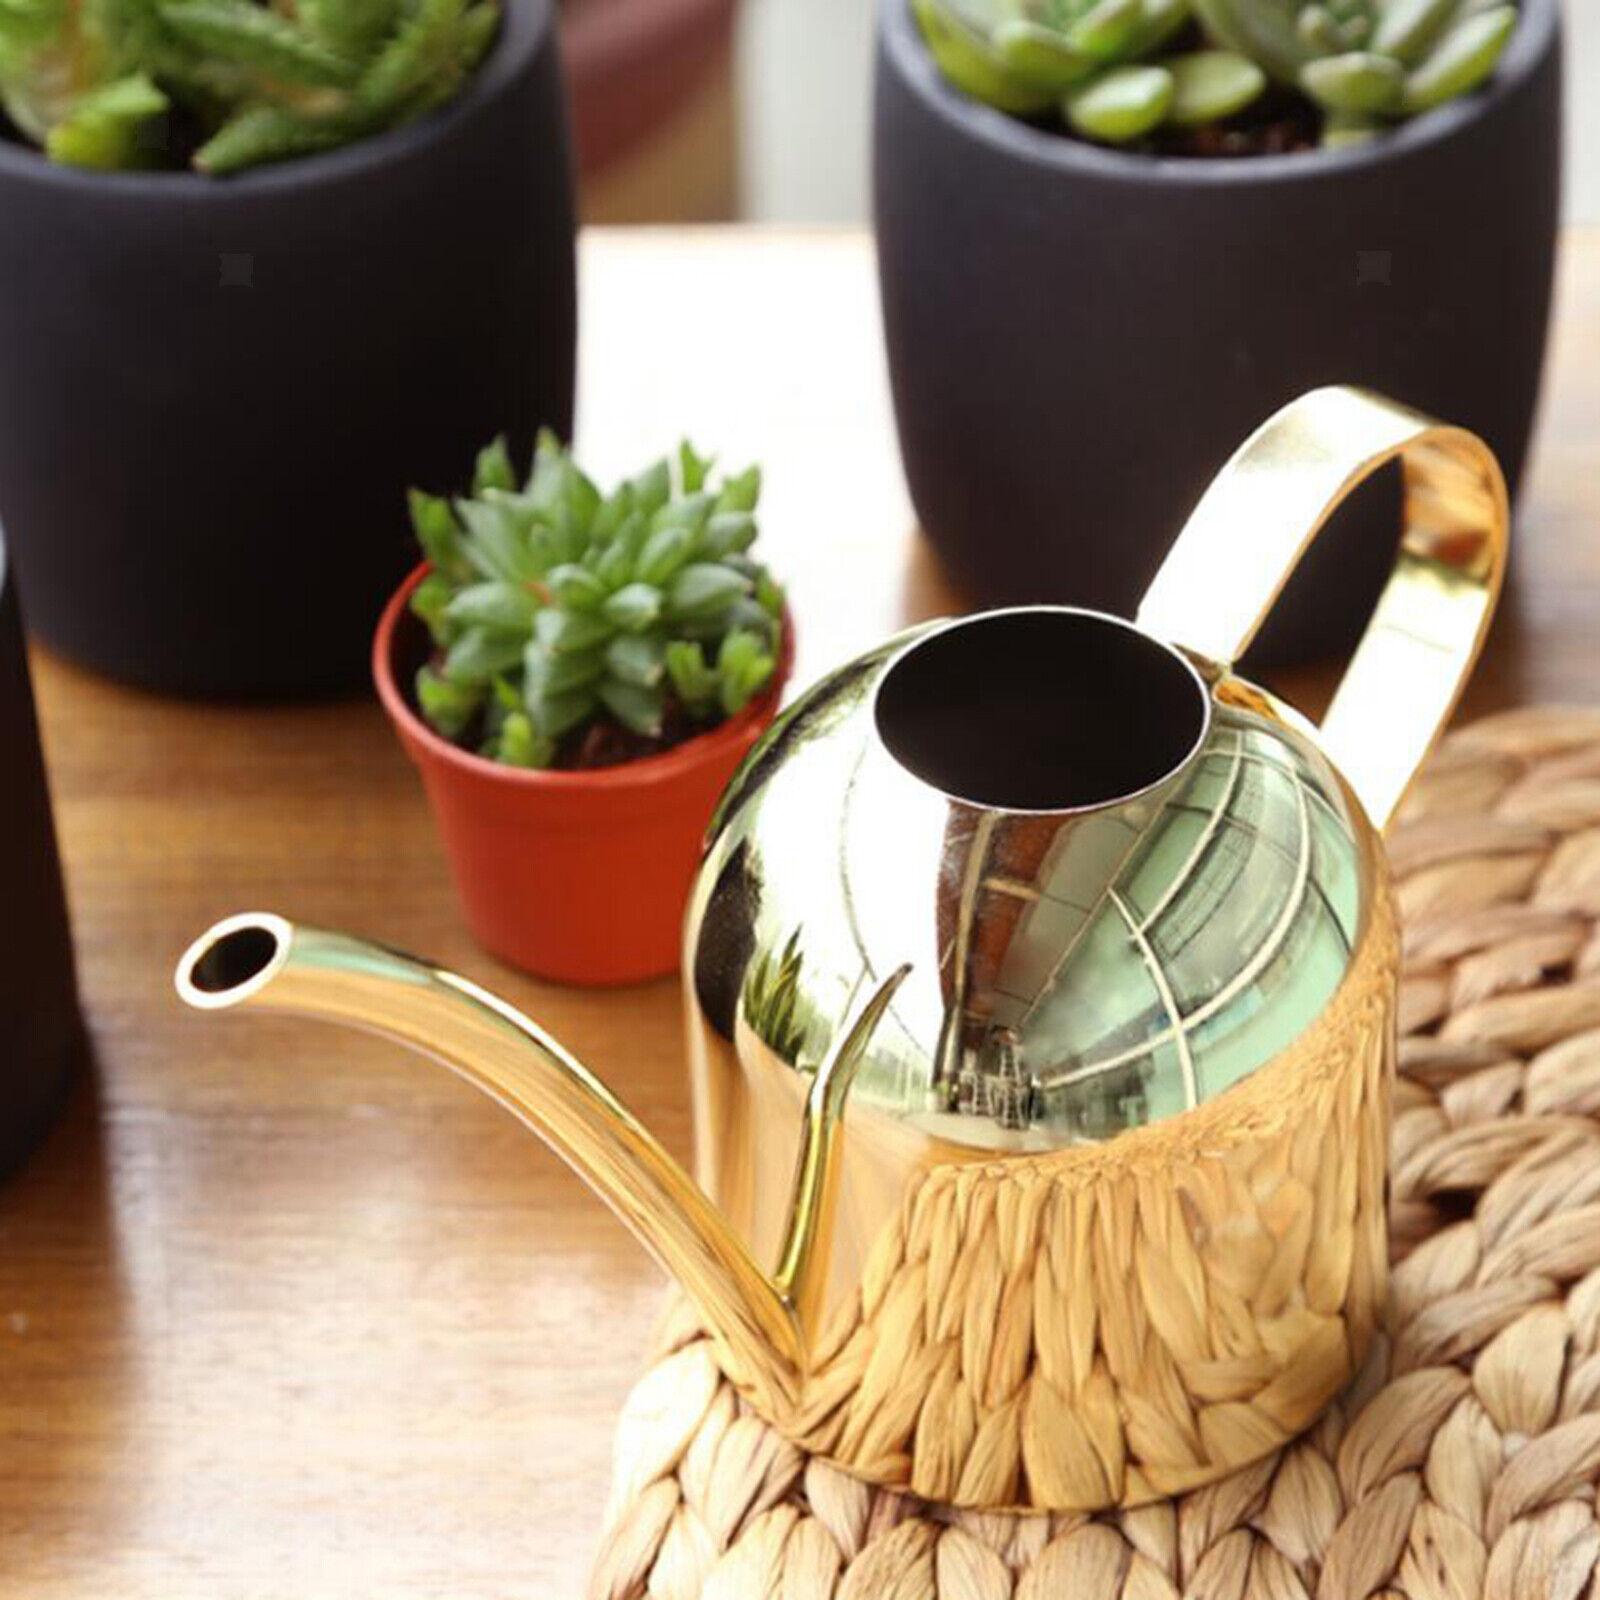 1000ml Watering Can Gardening Long Spout Flower Succulents Watering Pot